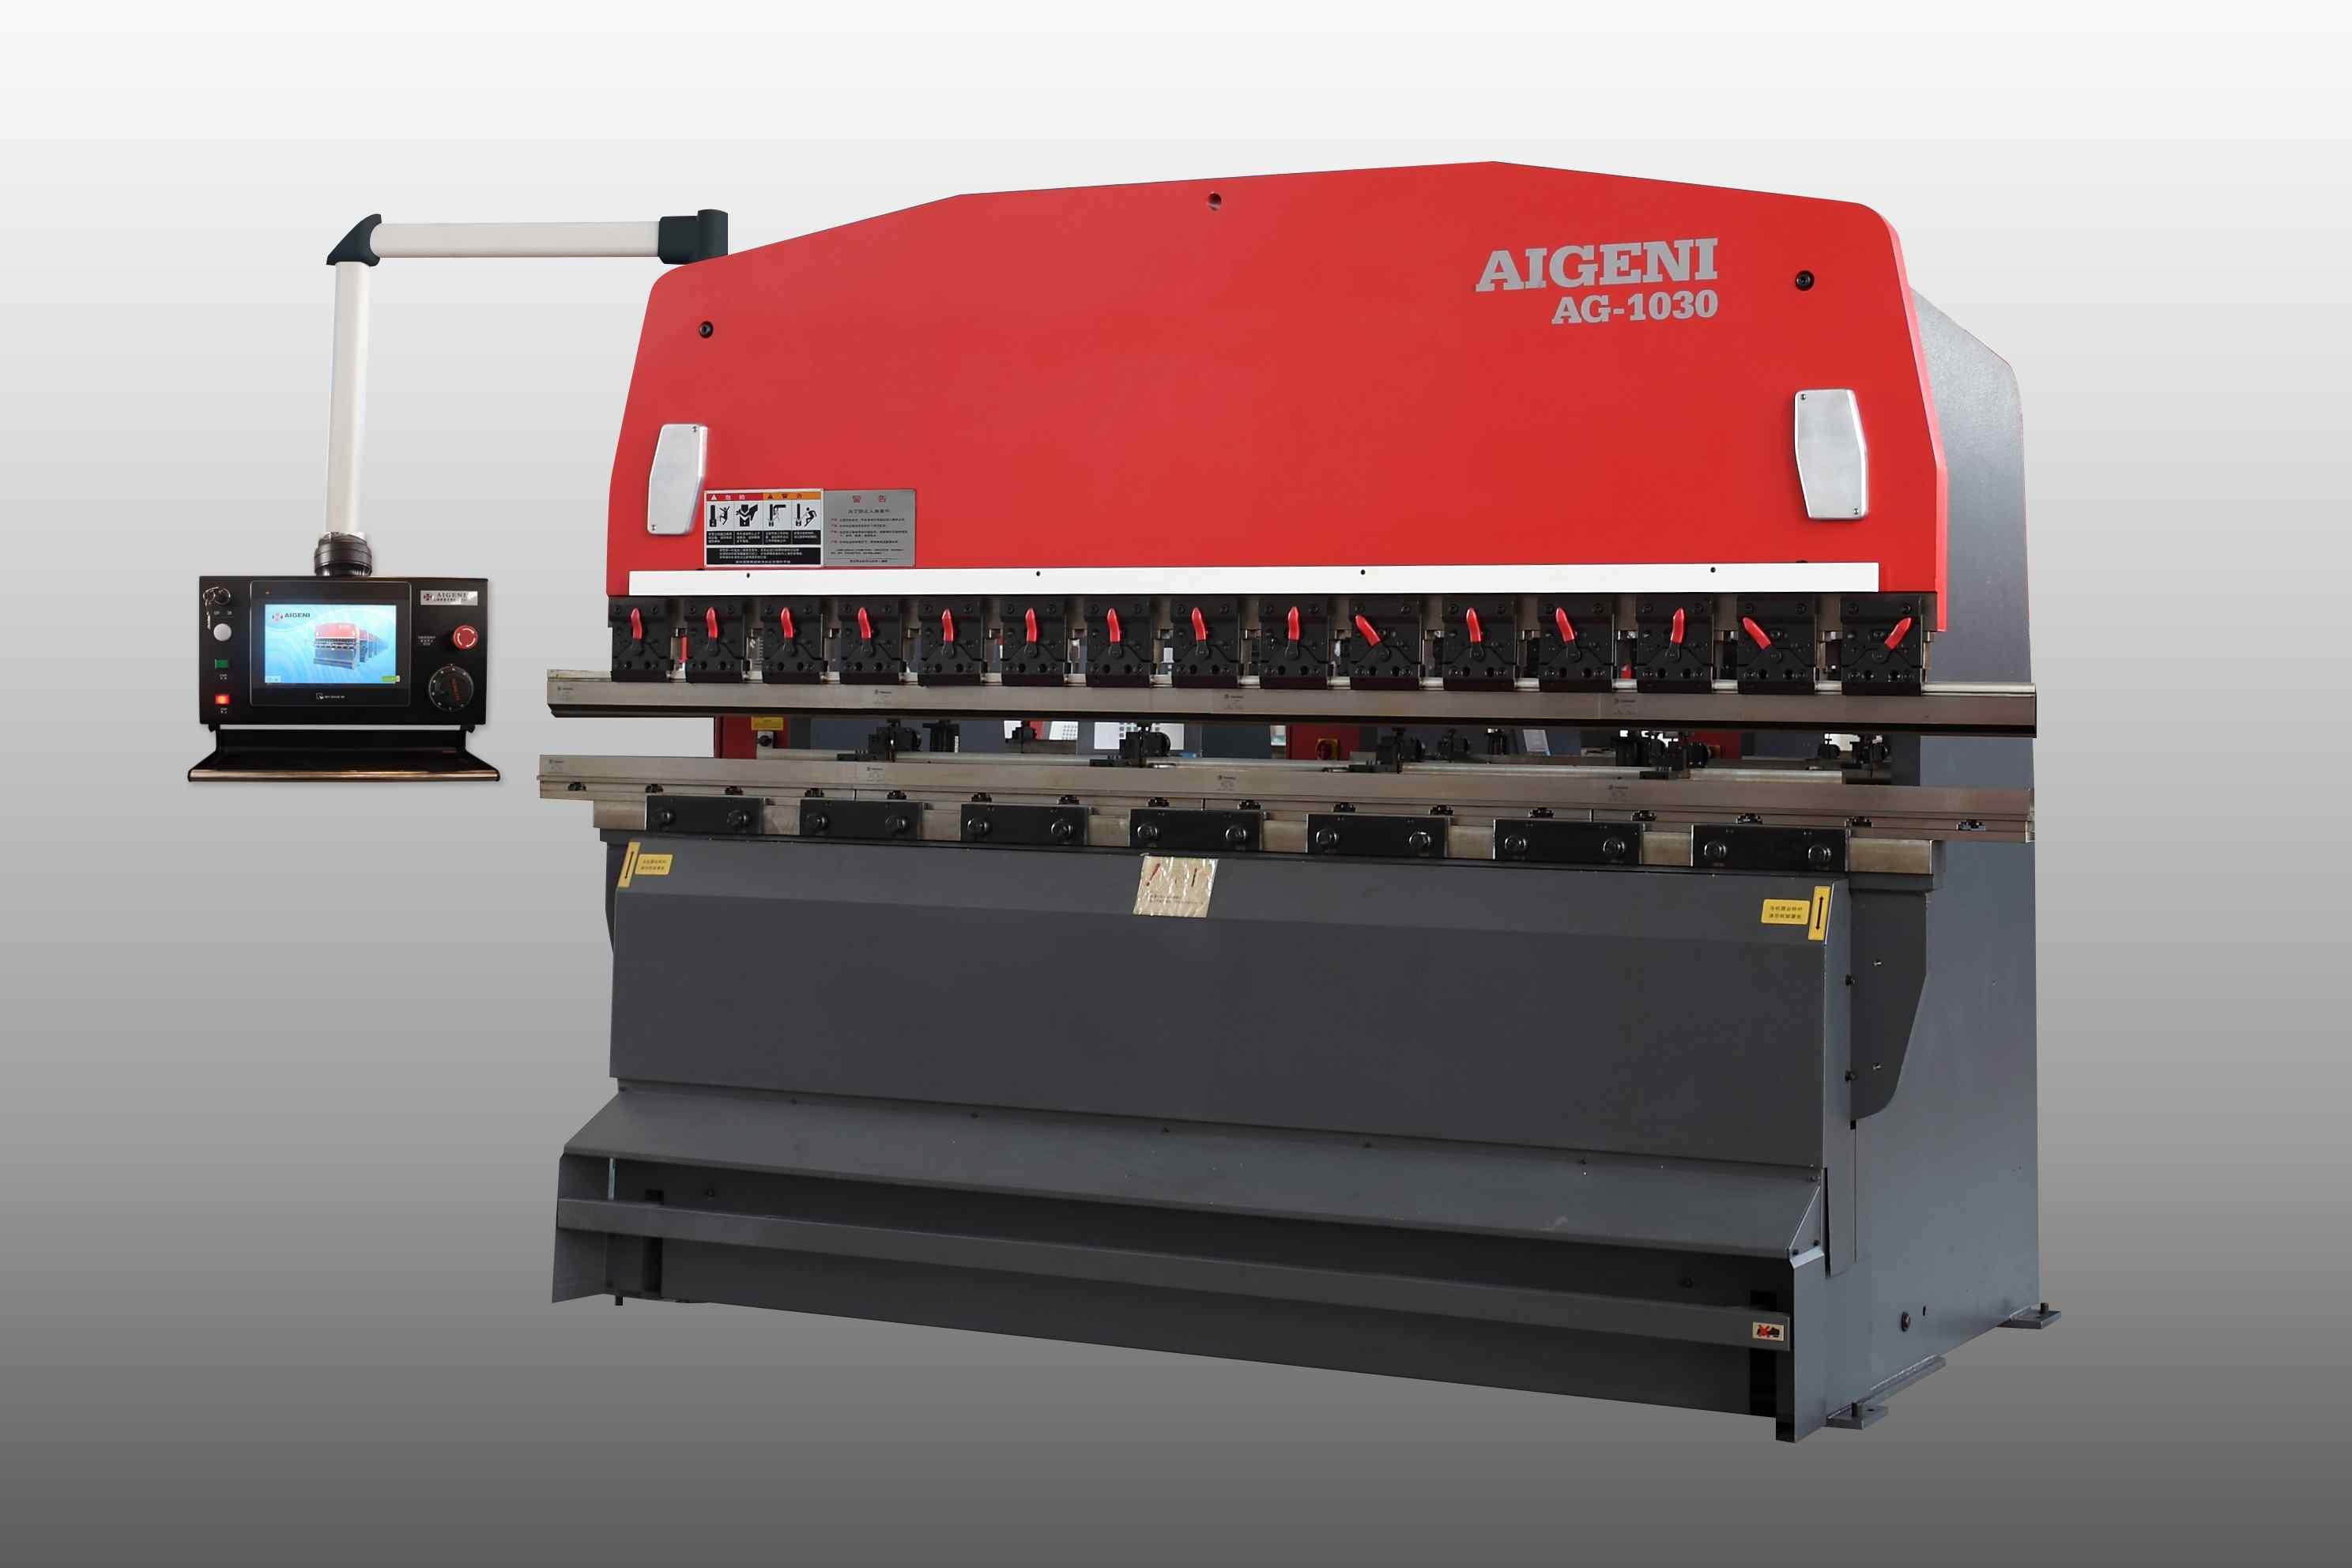 AG-1030